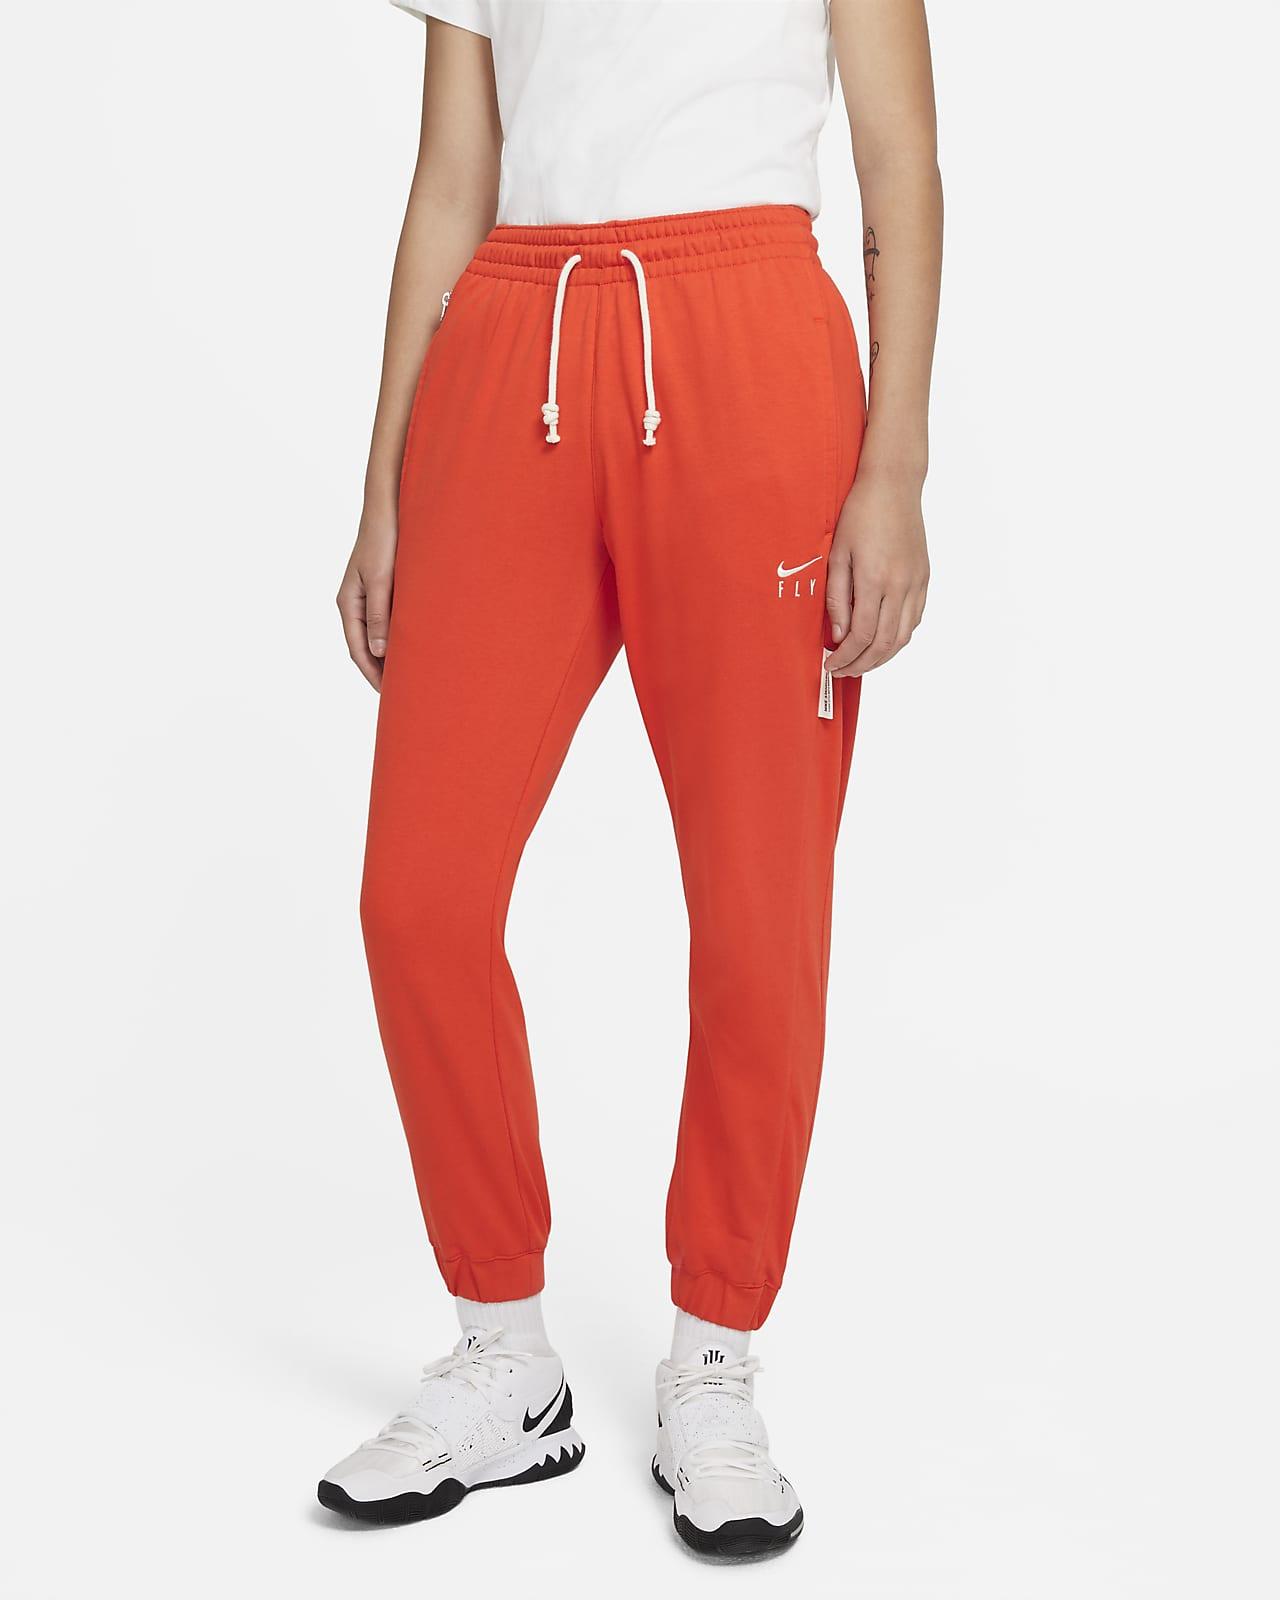 Nike Swoosh Fly Standard Issue Women's Basketball Pants